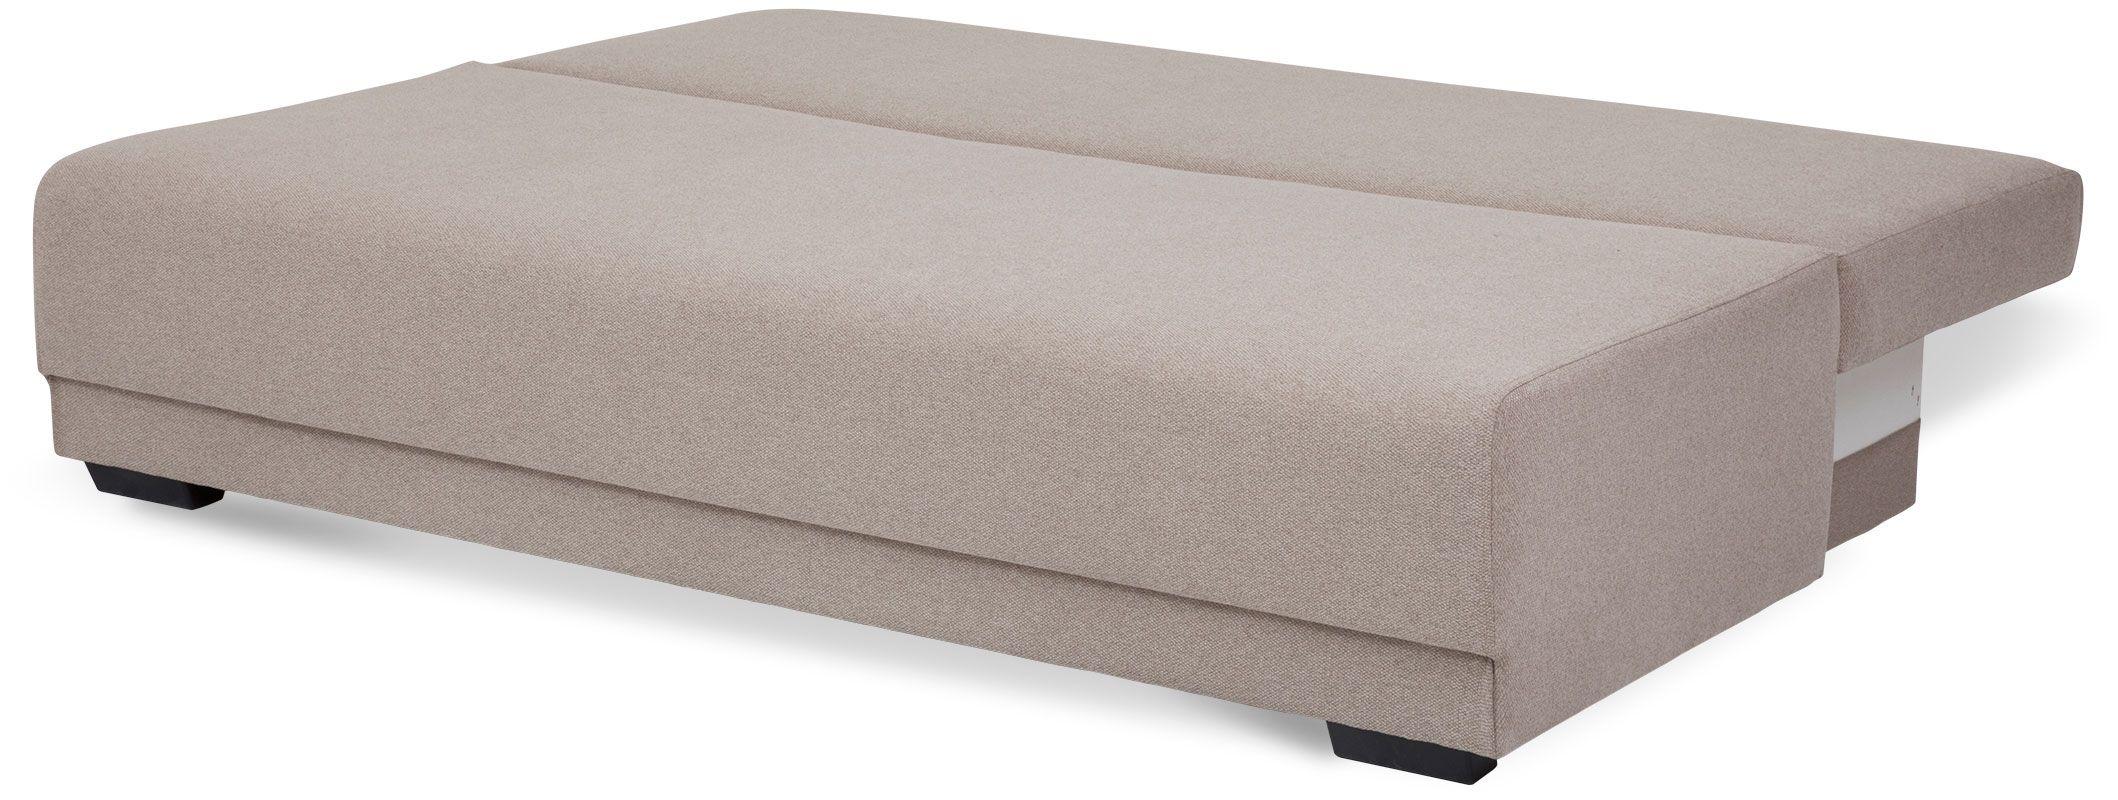 sofa preston 13